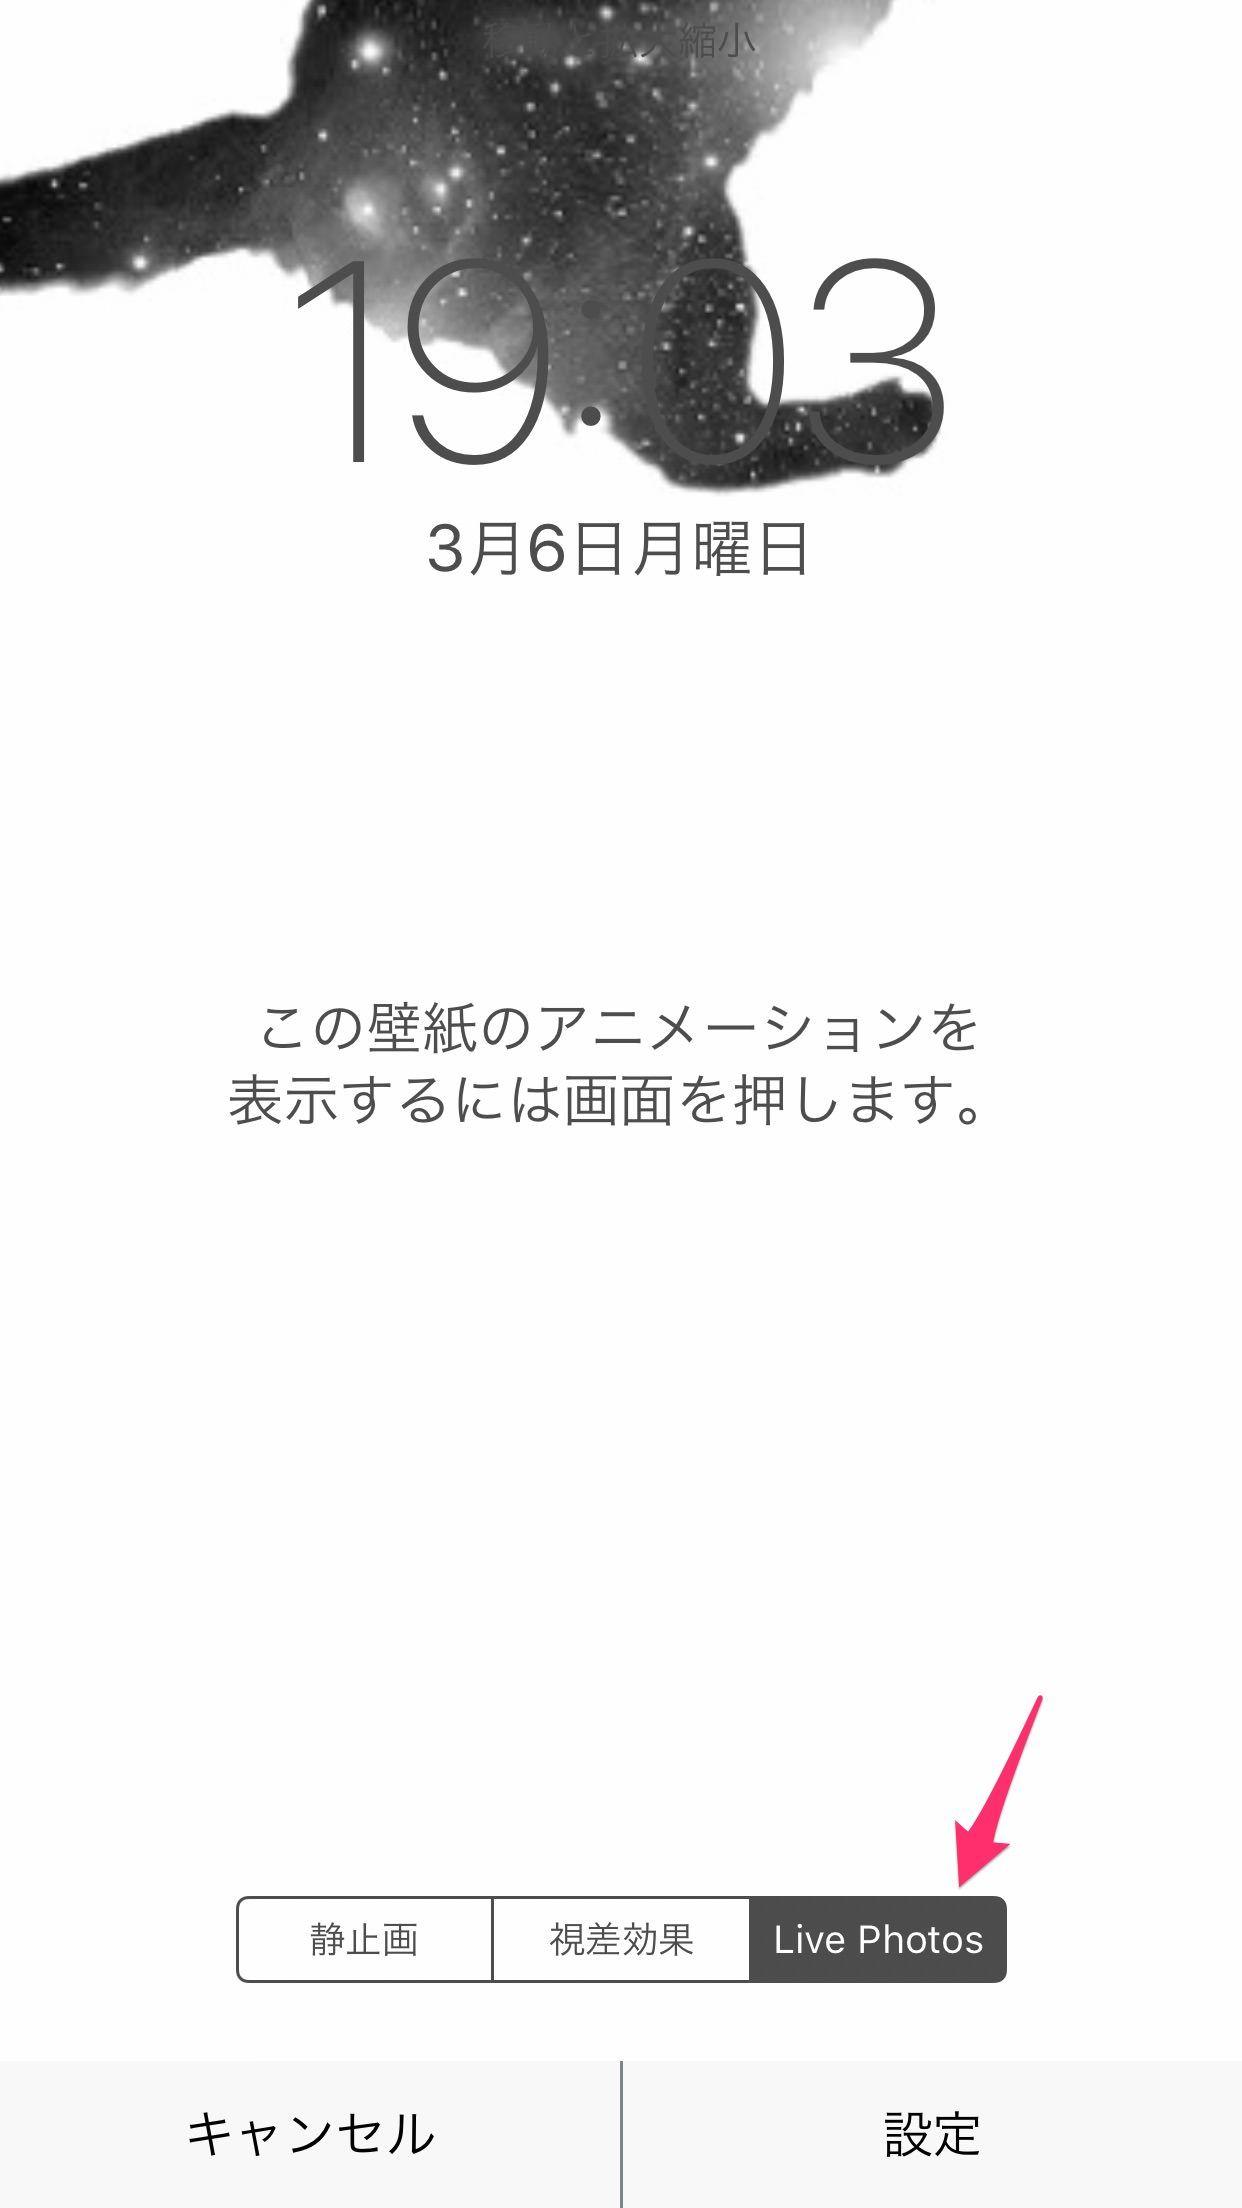 Livephoto Wallpaper 壁紙 教科書 お問い合わせフォーム